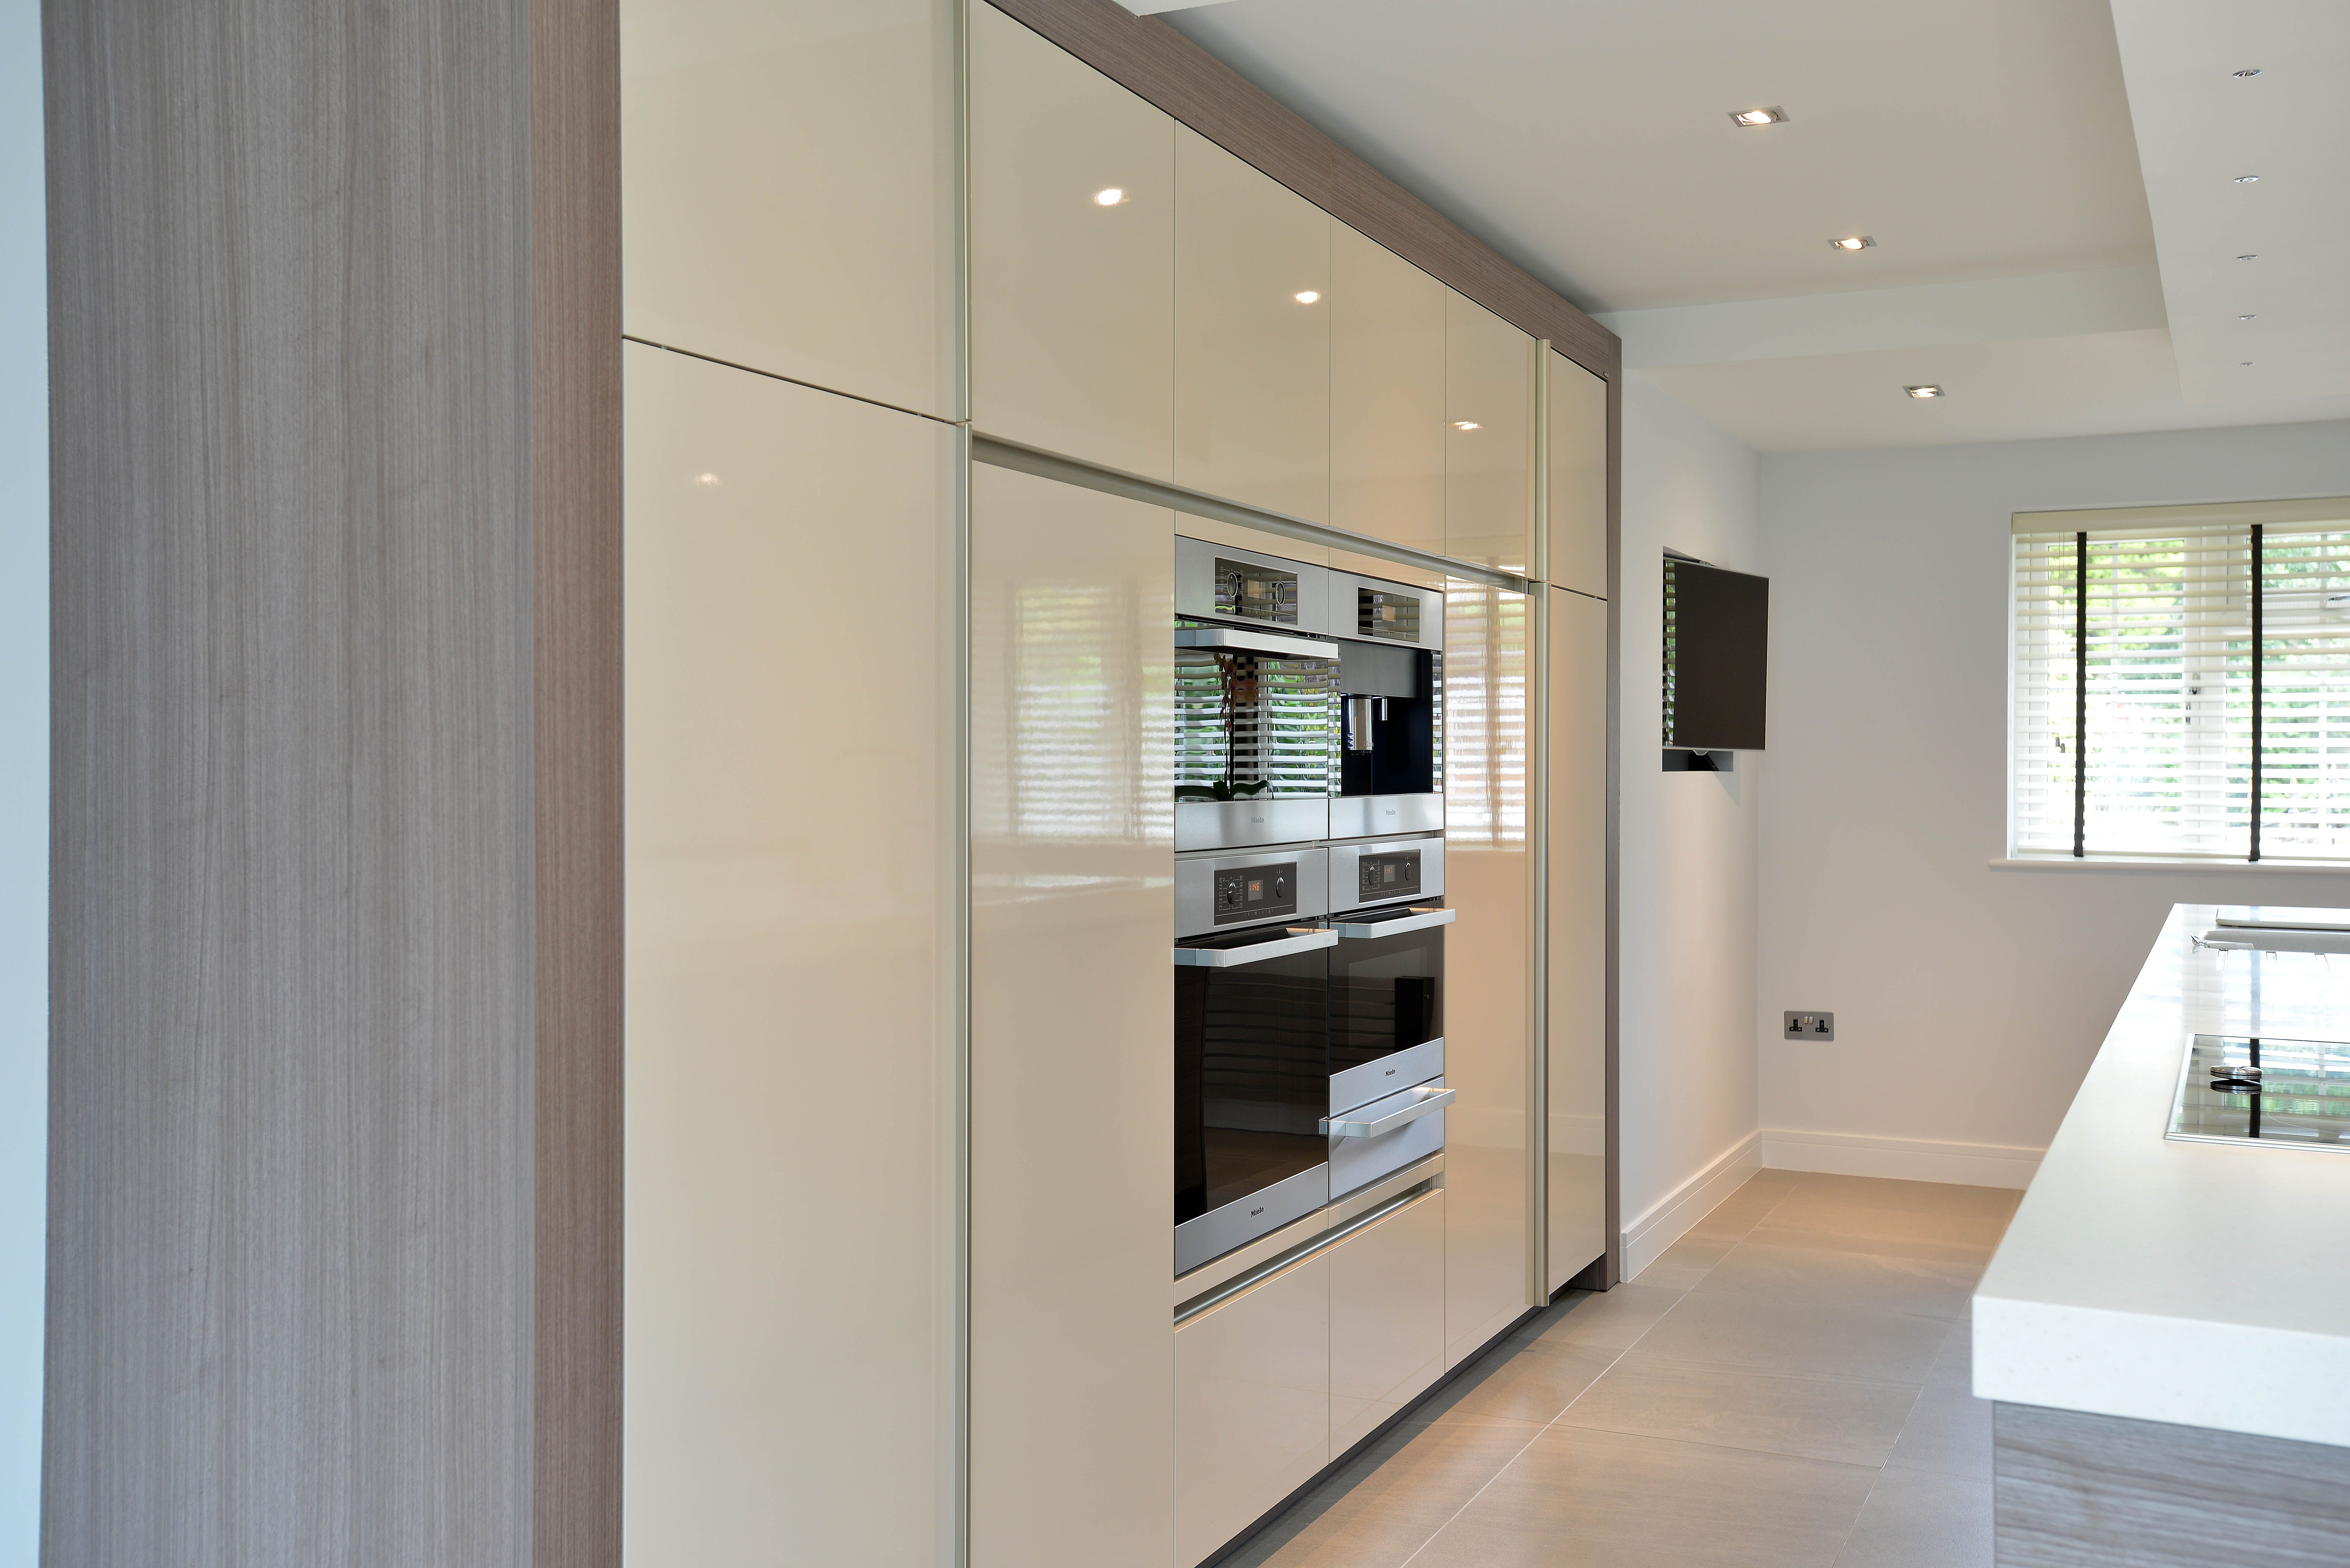 stunning bank of units incorporating neff appliances cuisine stunning bank of units incorporating neff appliances